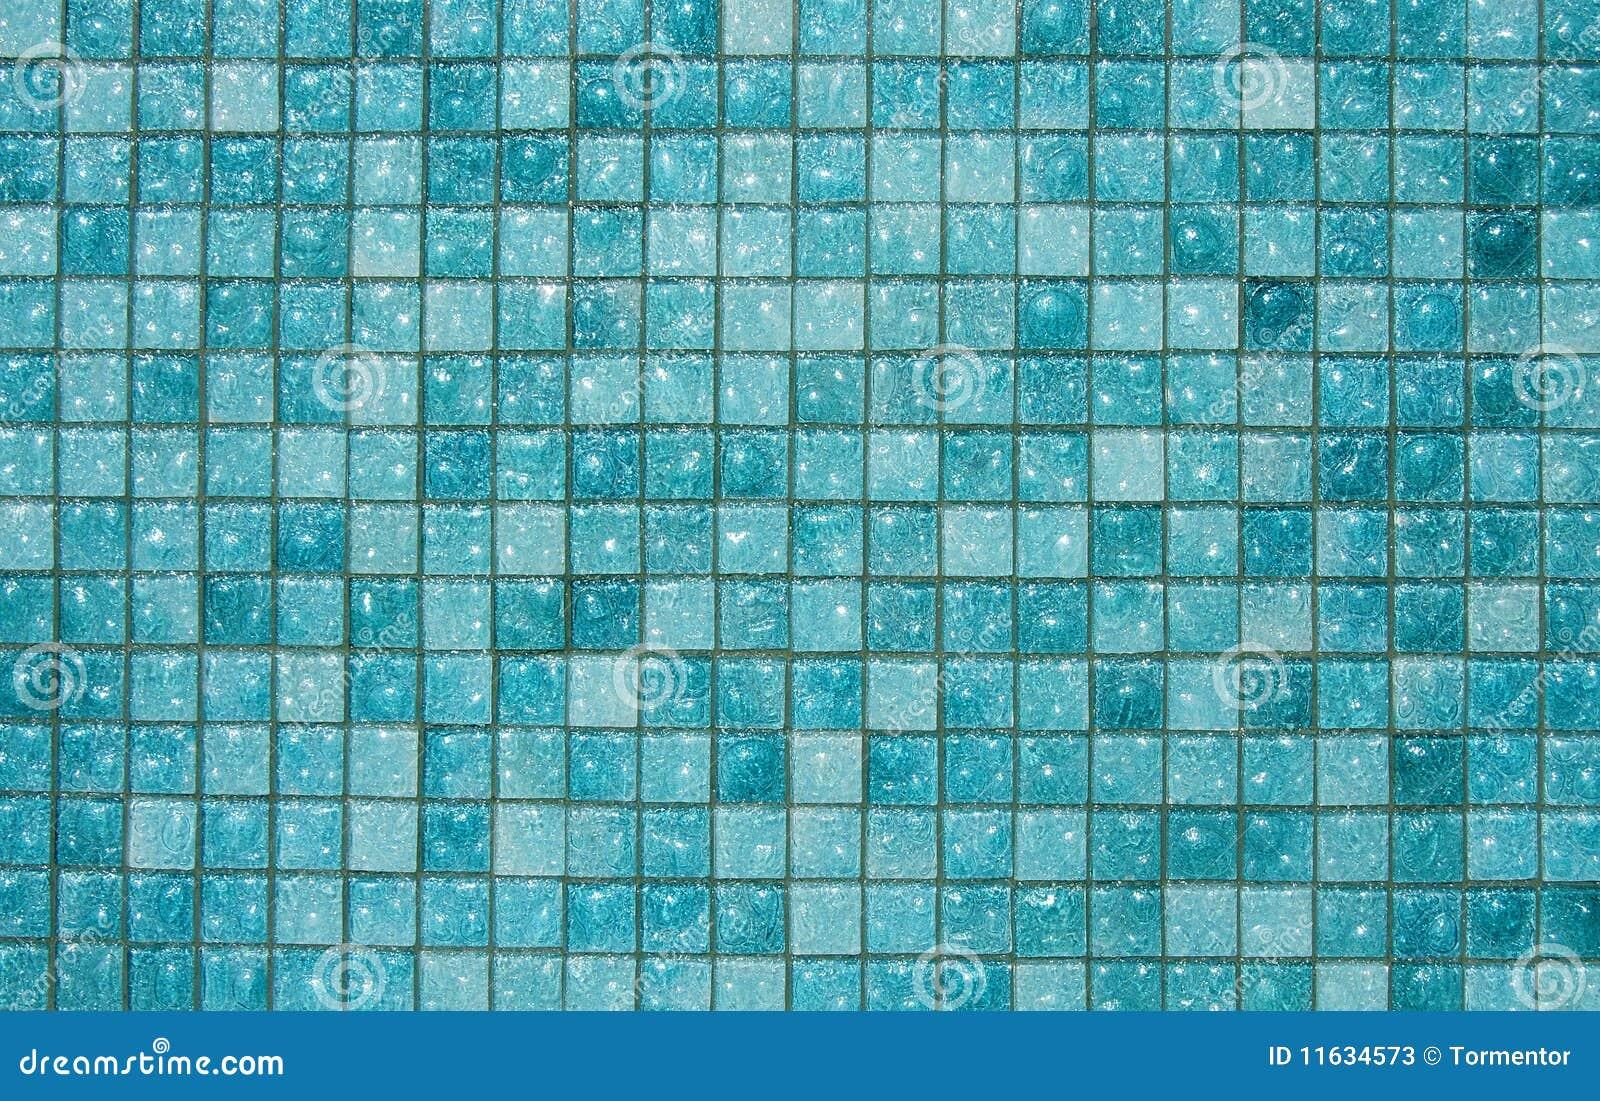 Glasfliesen  Blaue Glasfliesen Stockfotos - Bild: 11634573